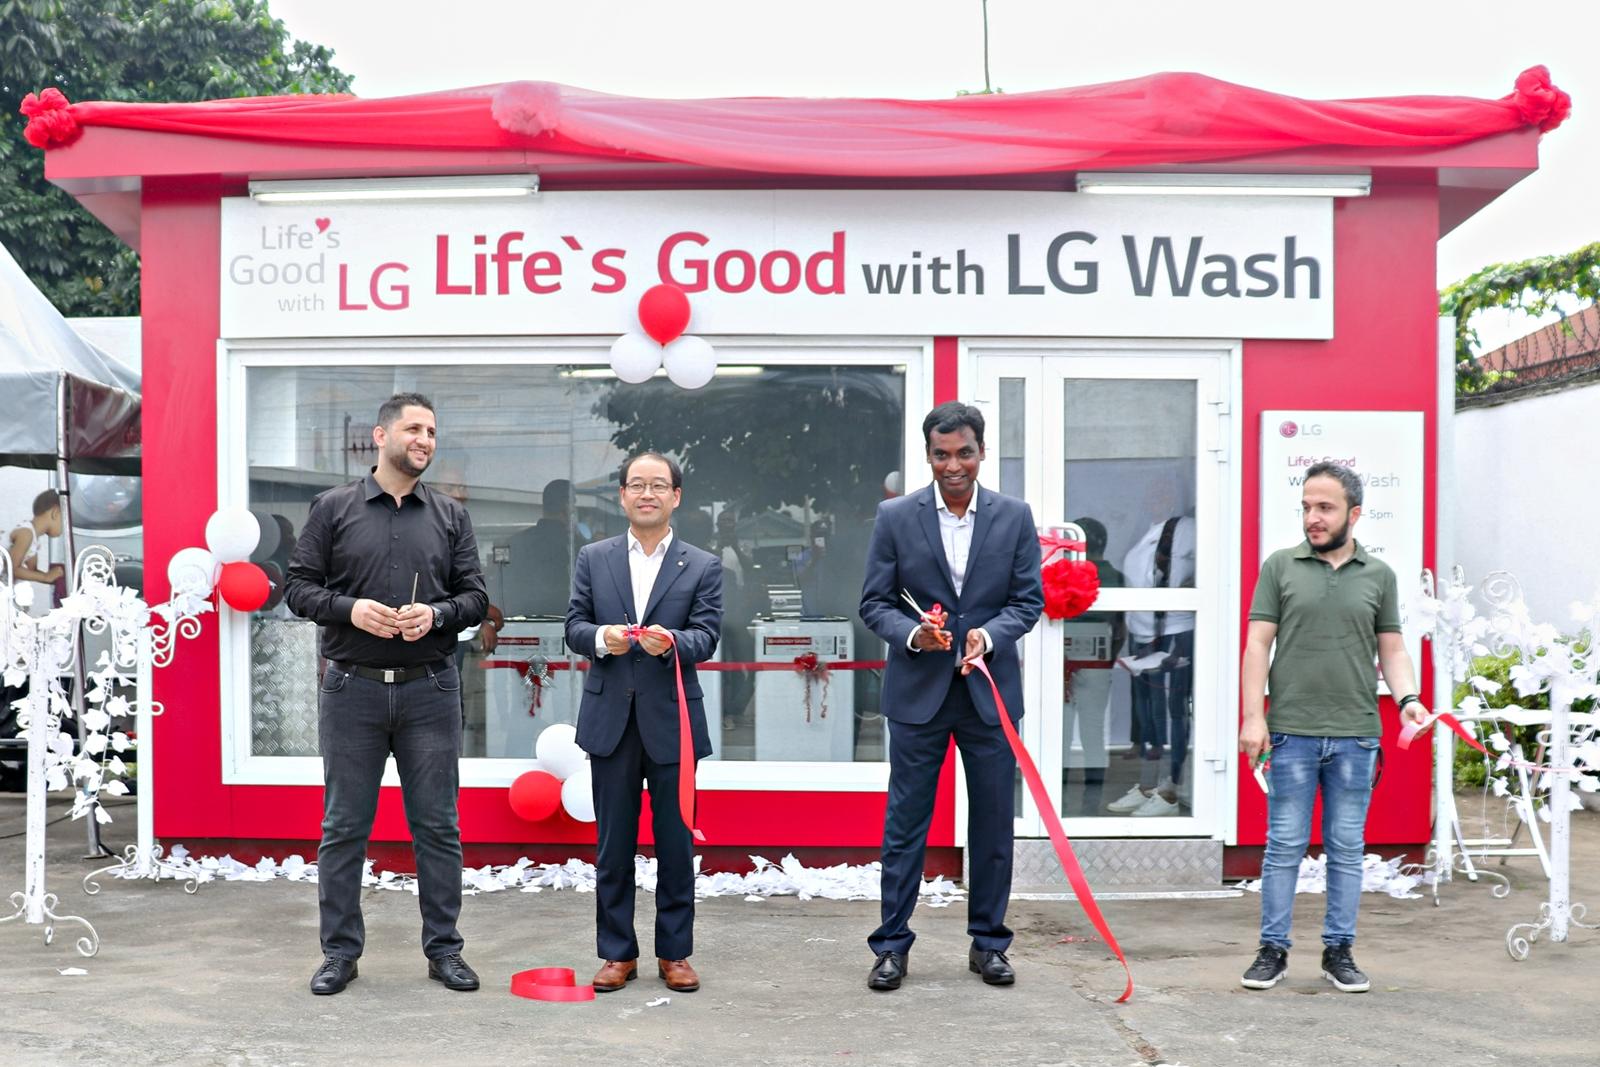 LG전자가 최근 나이지리아 음보음바 마을에 무료 세탁방인 '라이프스 굿 위드 LG 워시(Life's Good with LG Wash)'를 열었다. 무료 세탁방 개소식에서 관계자들이 테이프 커팅을 하고 있다.